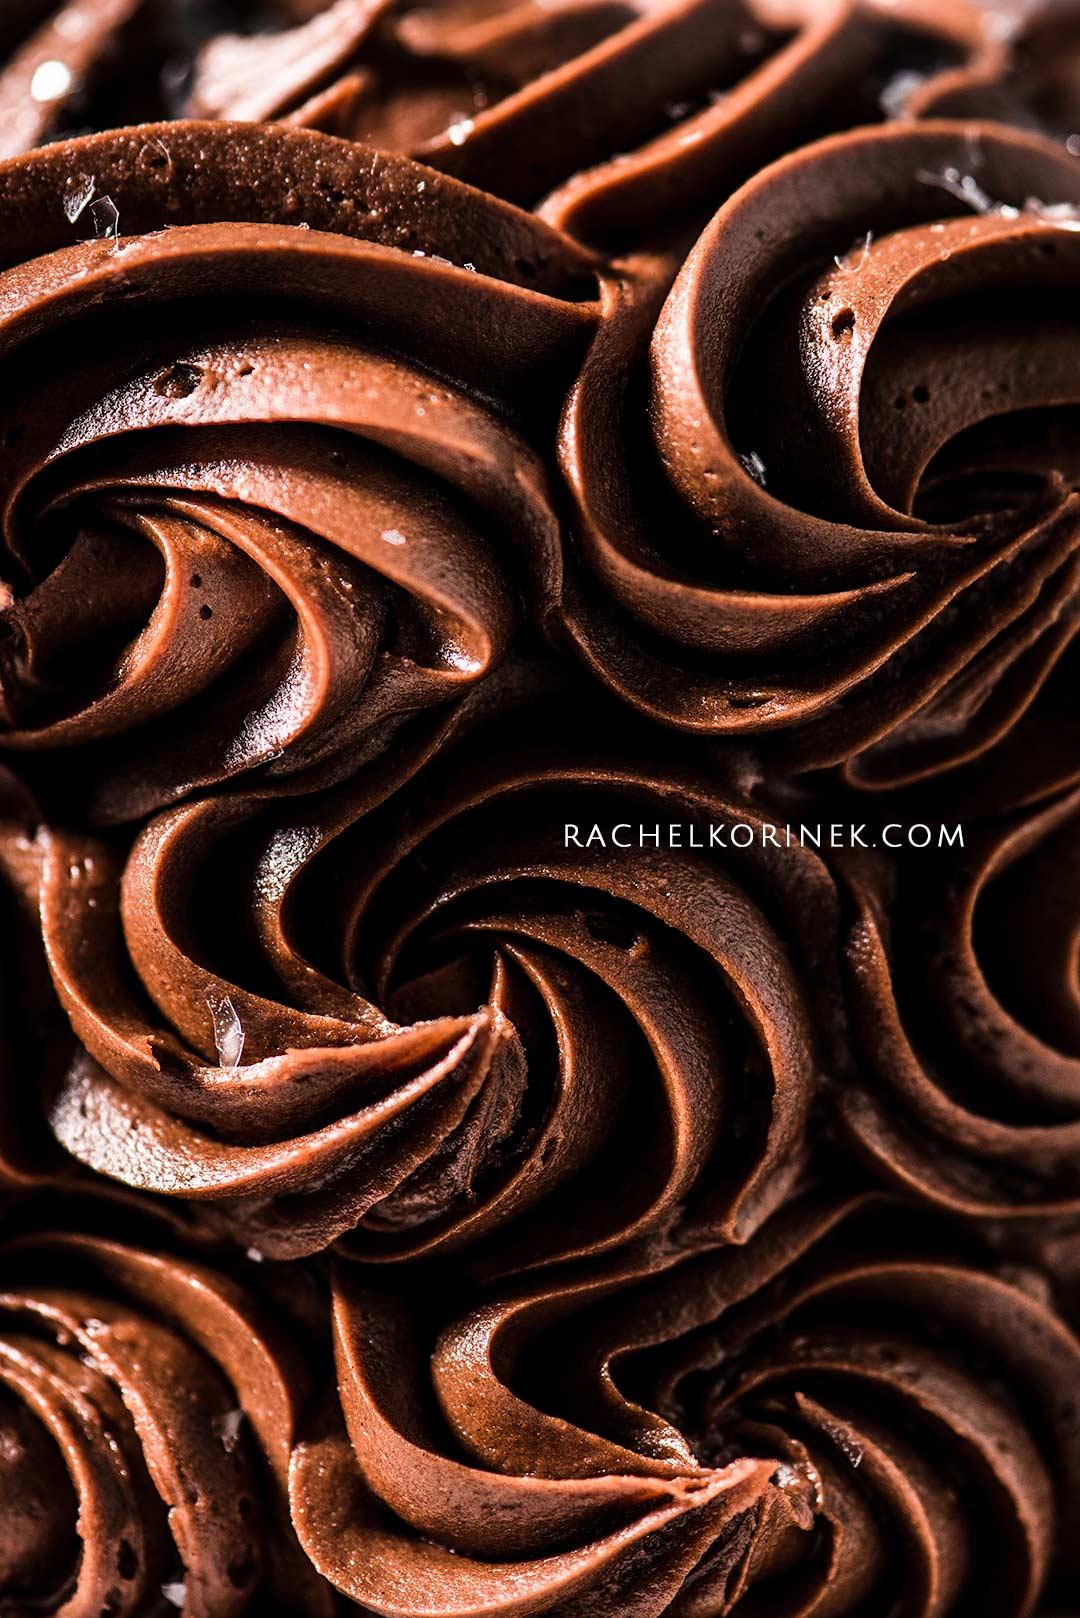 Rachel Korinek Food Photographer | Chocolate Swirl Cake  Click to check out my latest food photography projects.  #twolovesstudio #beautifulcuisine #foodbloggerpro #foodphotography #learnfoodphotography #foodblogger #learnphotography #foodstyling #lightingtips #naturallight #foodphotographer